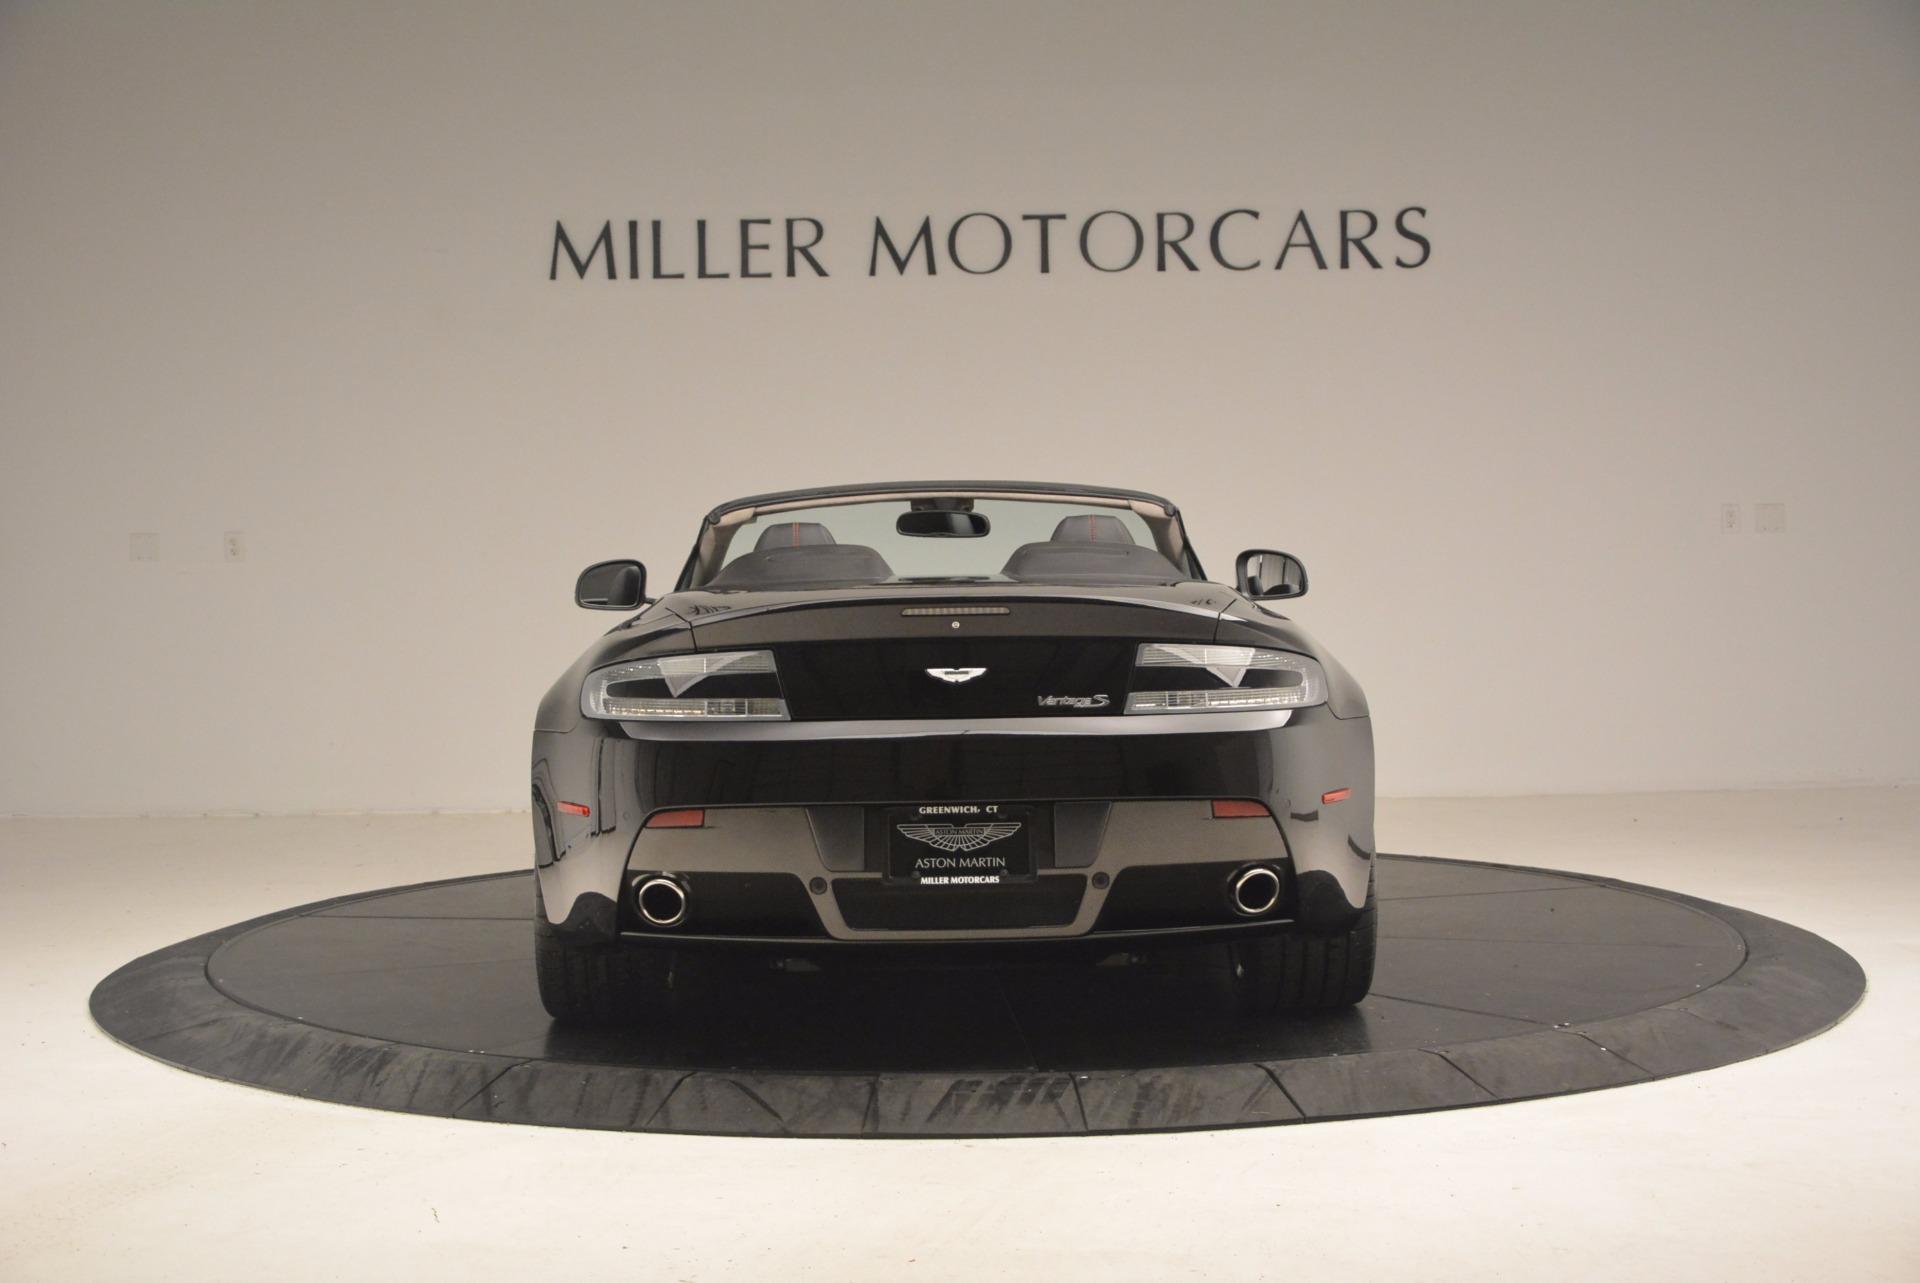 Used 2012 Aston Martin V8 Vantage S Roadster For Sale In Westport, CT 1181_p6